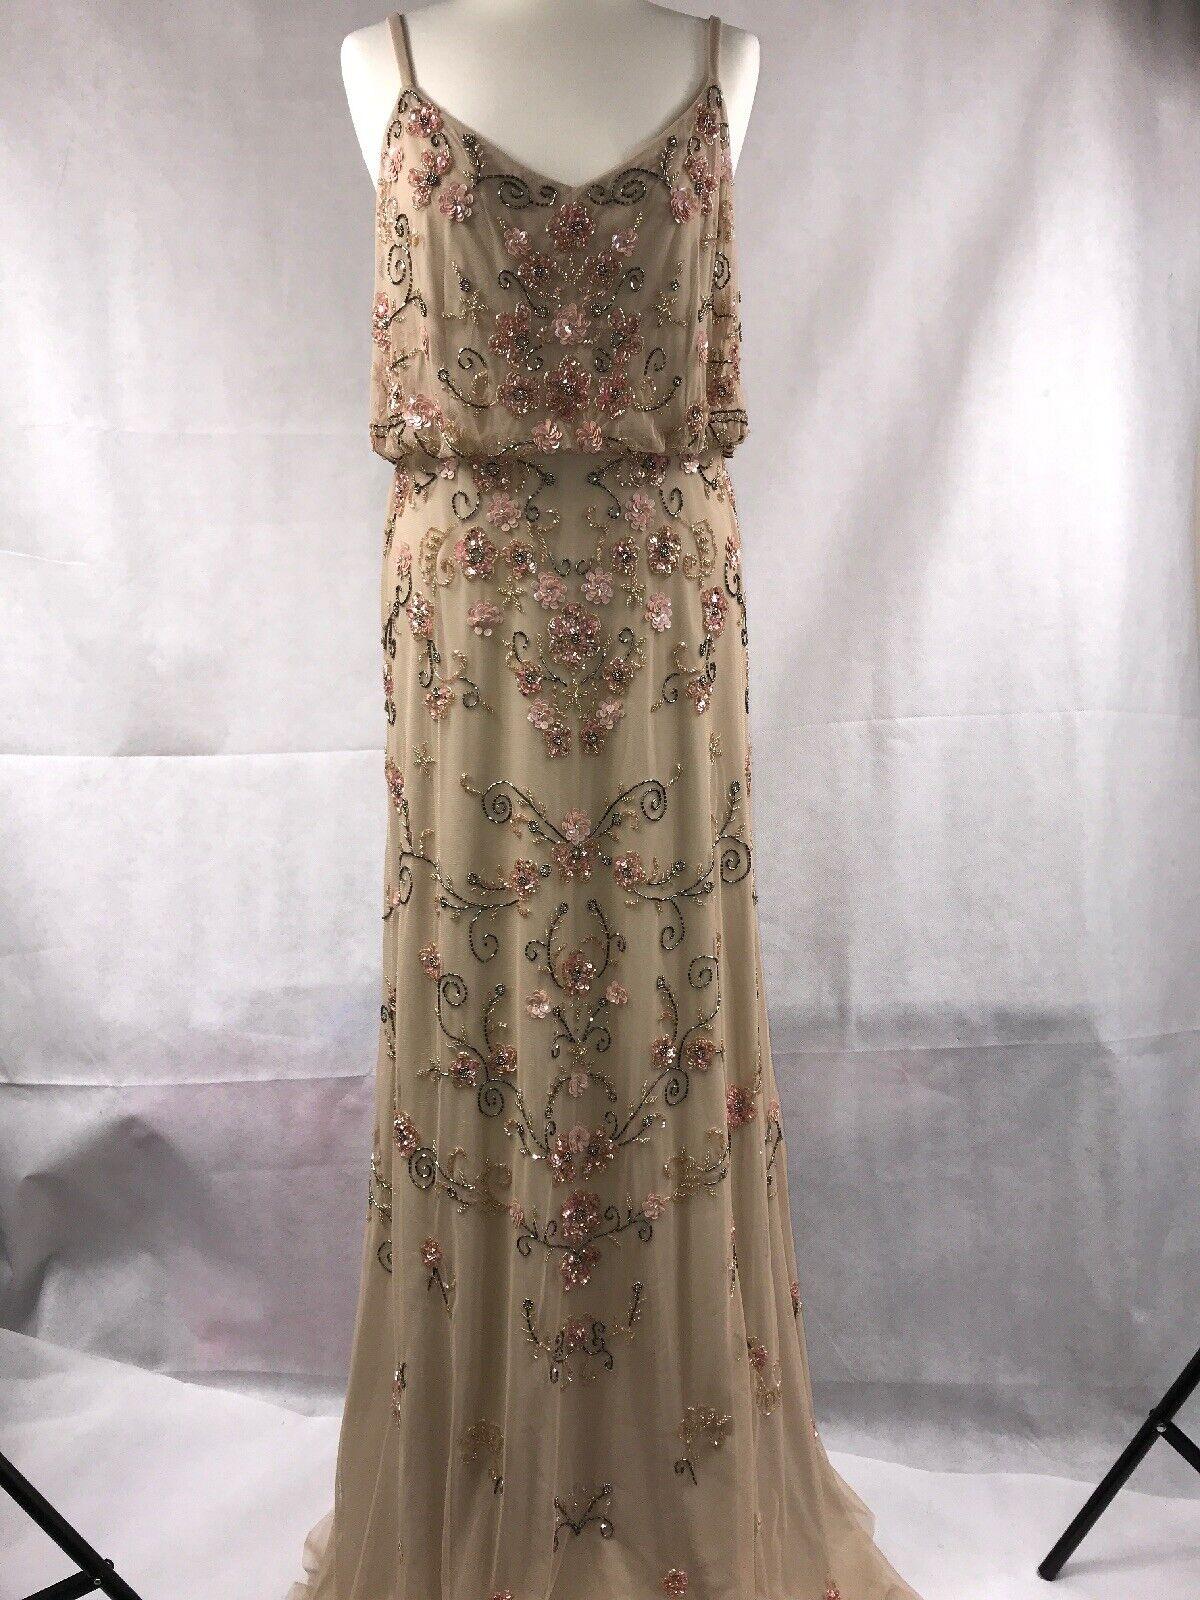 Adrianna papell Dress 14 BNWT